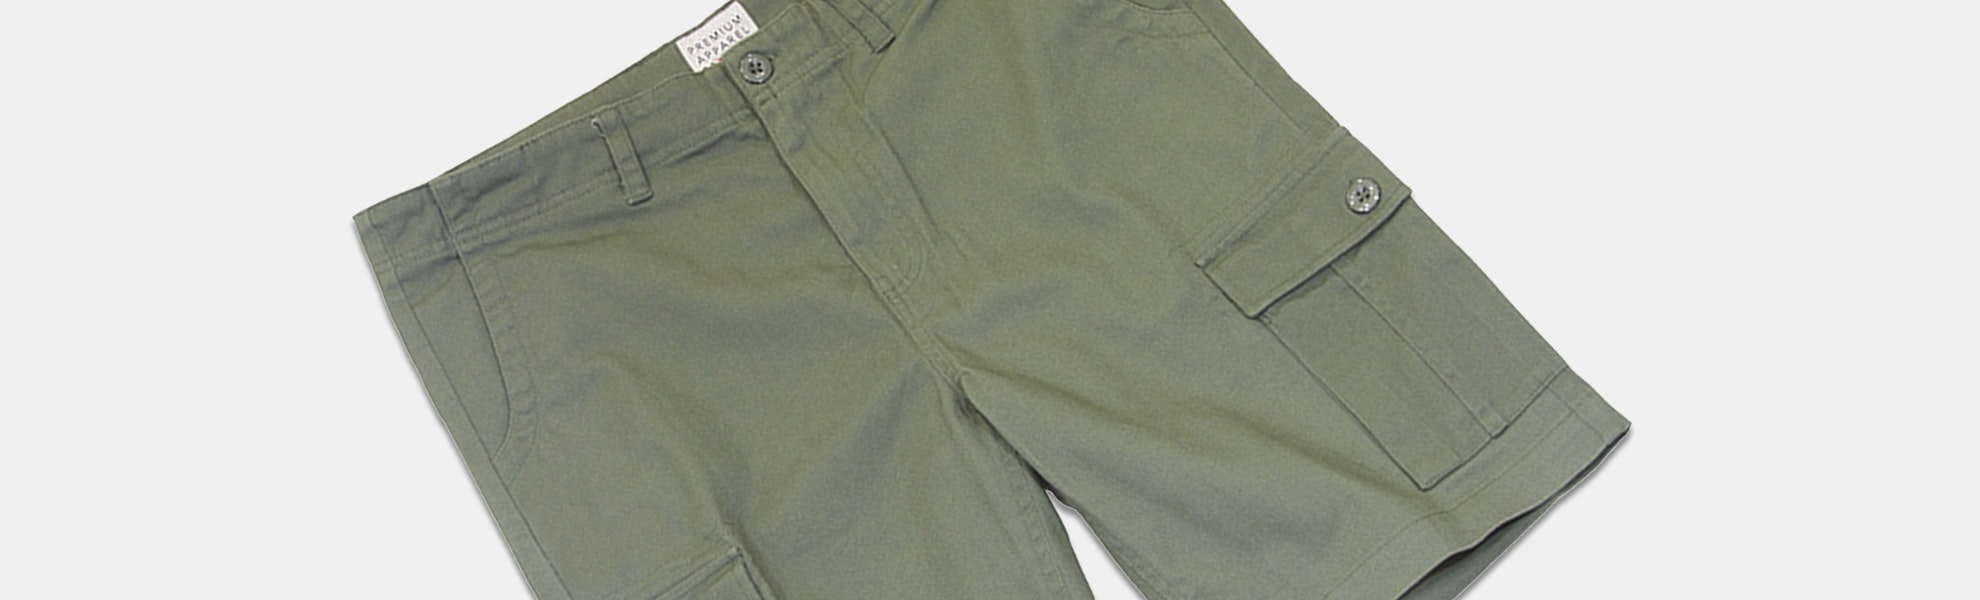 P.A.C. Cargo Shorts & Pants